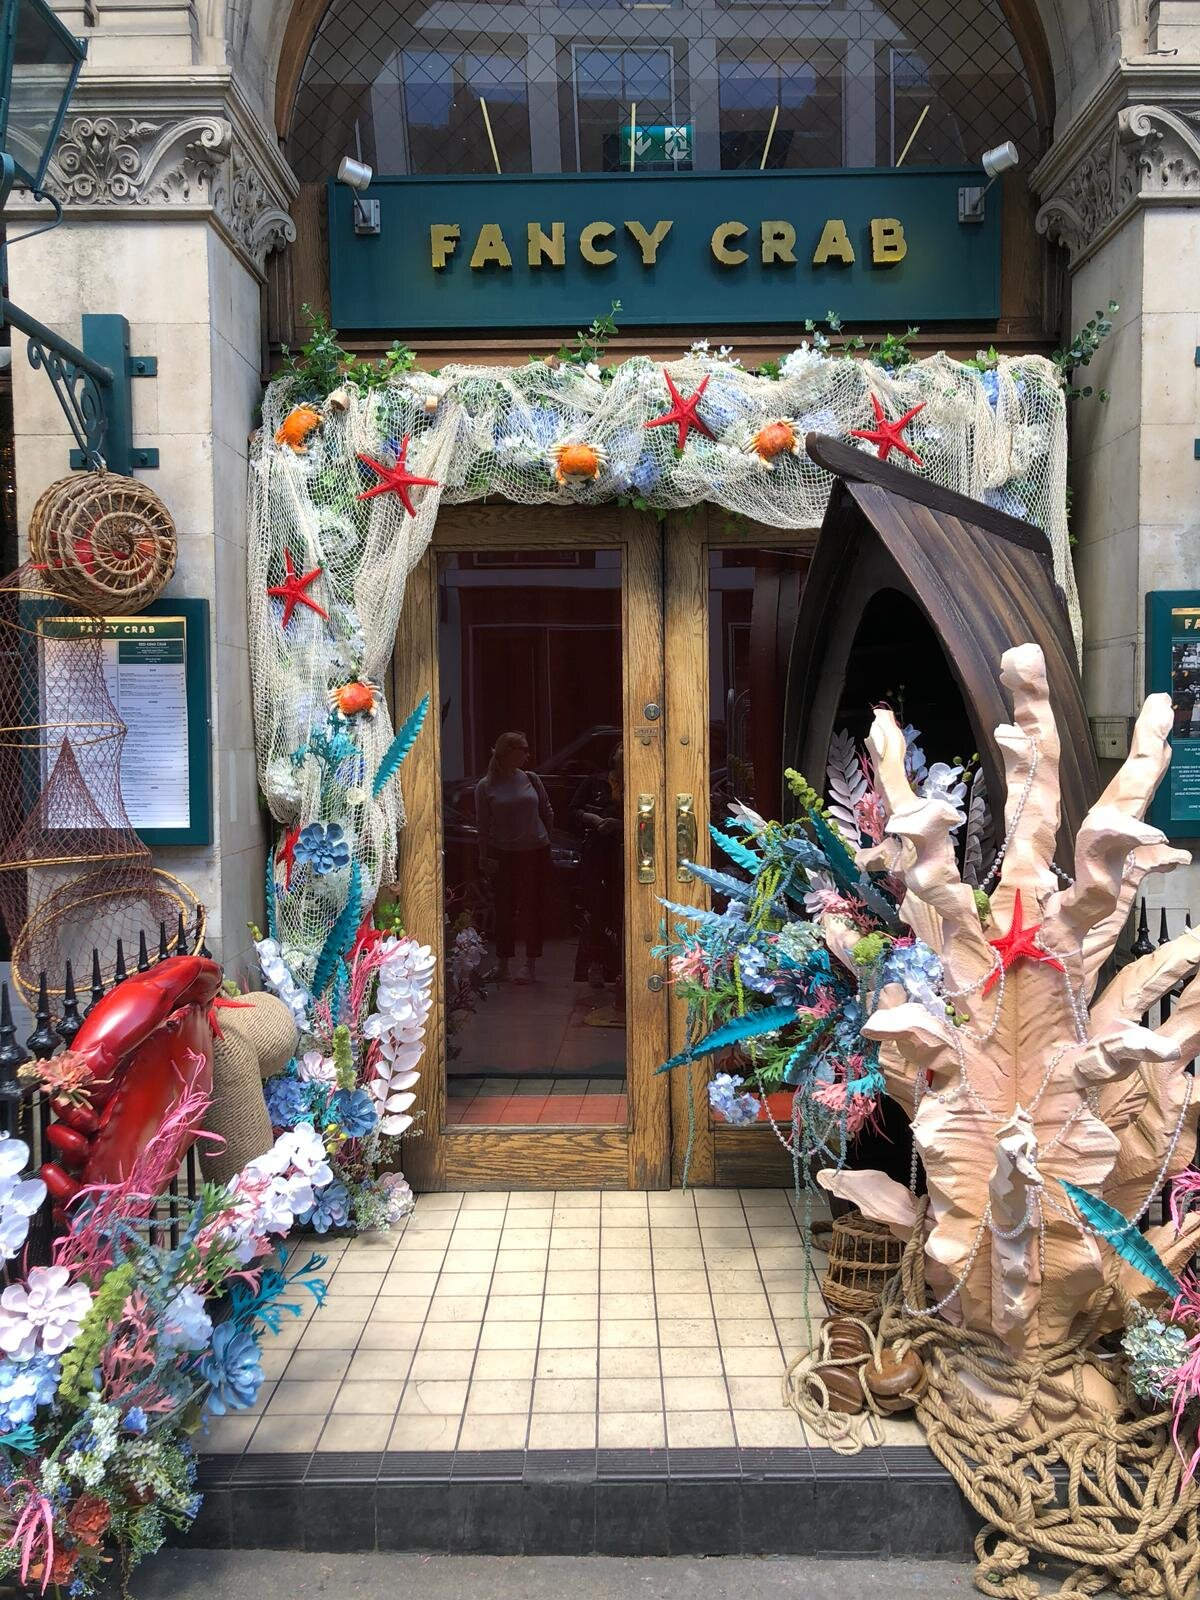 Under The Sea - FANCY CRAB | LONDON